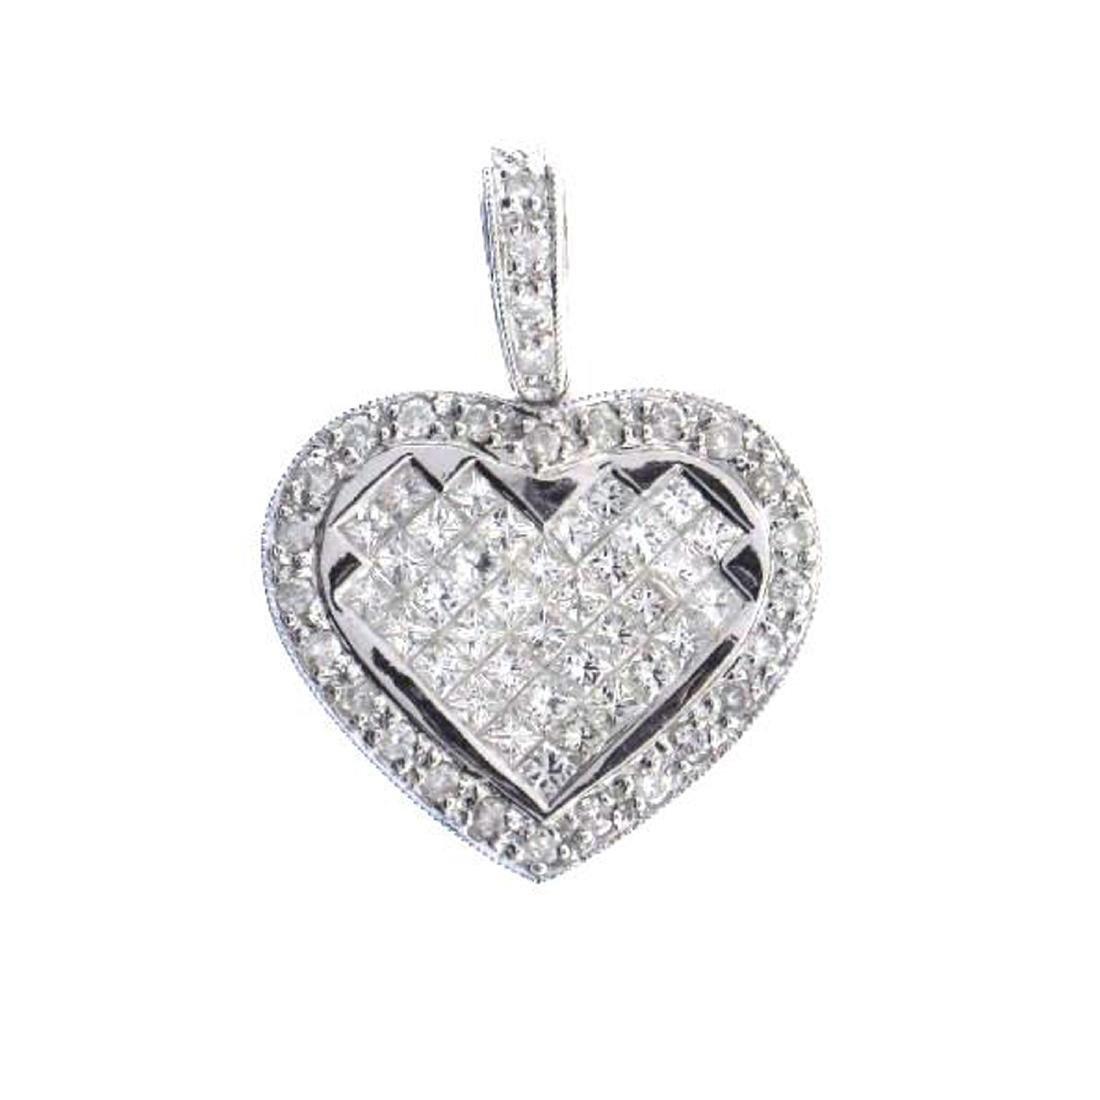 *Fine Jewelry, 14KT White Gold, 0.92CT Princess Cut